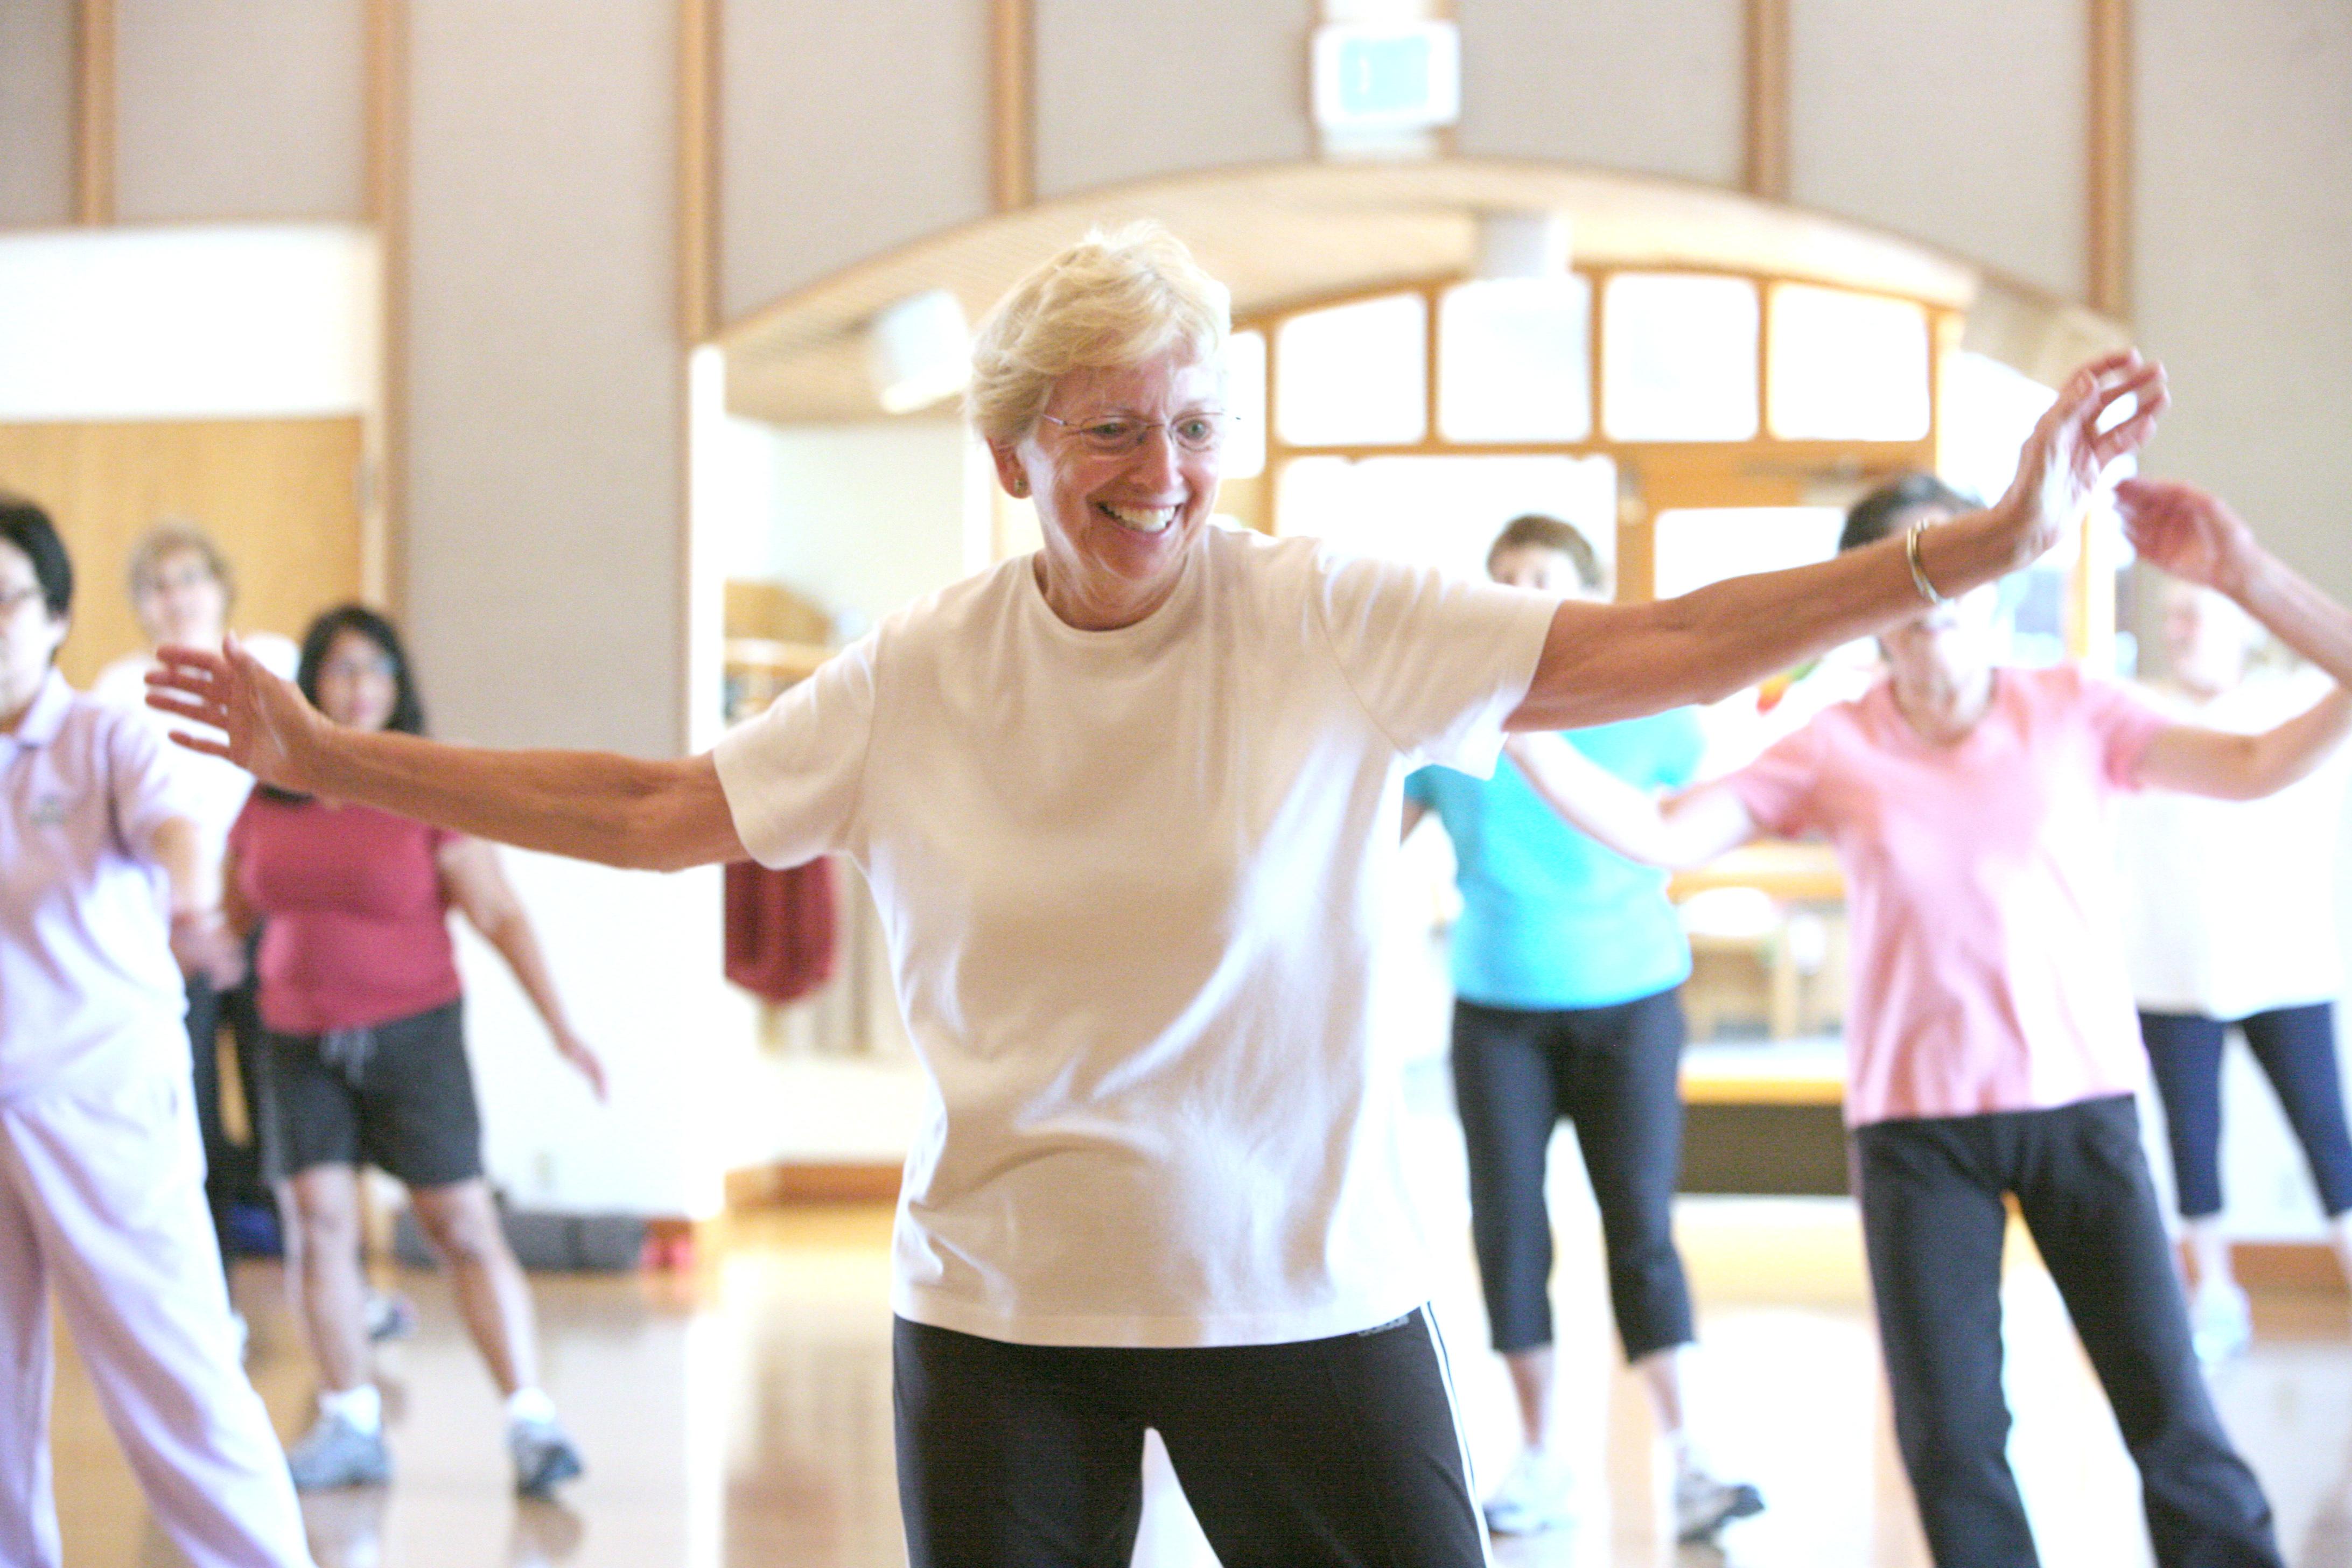 dance cardio for seniors